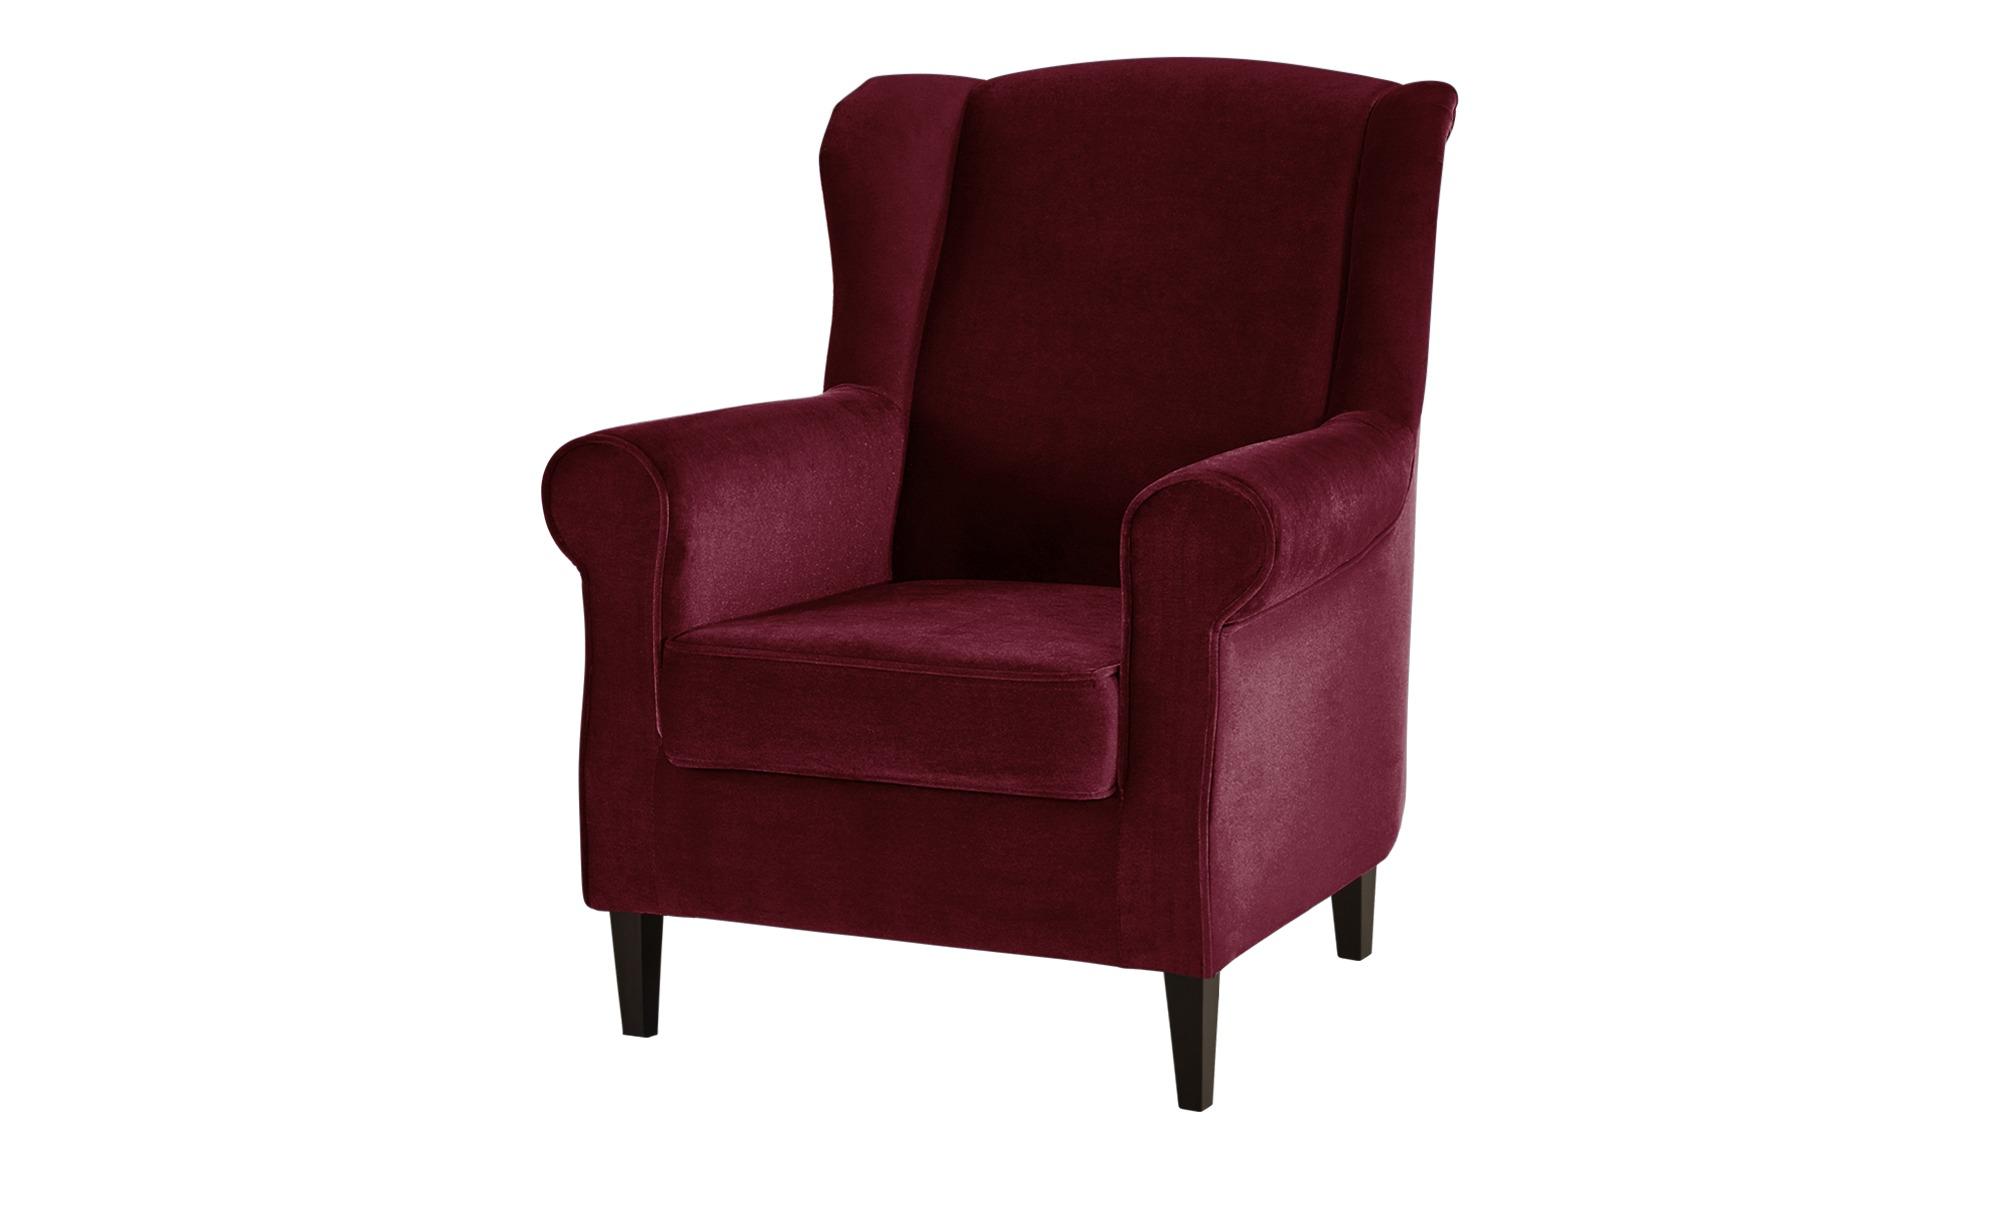 Ohrensessel rot - Stoff Britta ¦ rot ¦ Maße (cm): B: 81 H: 100 T: 90 Polstermöbel > Sessel > Ohrensessel - Höffner